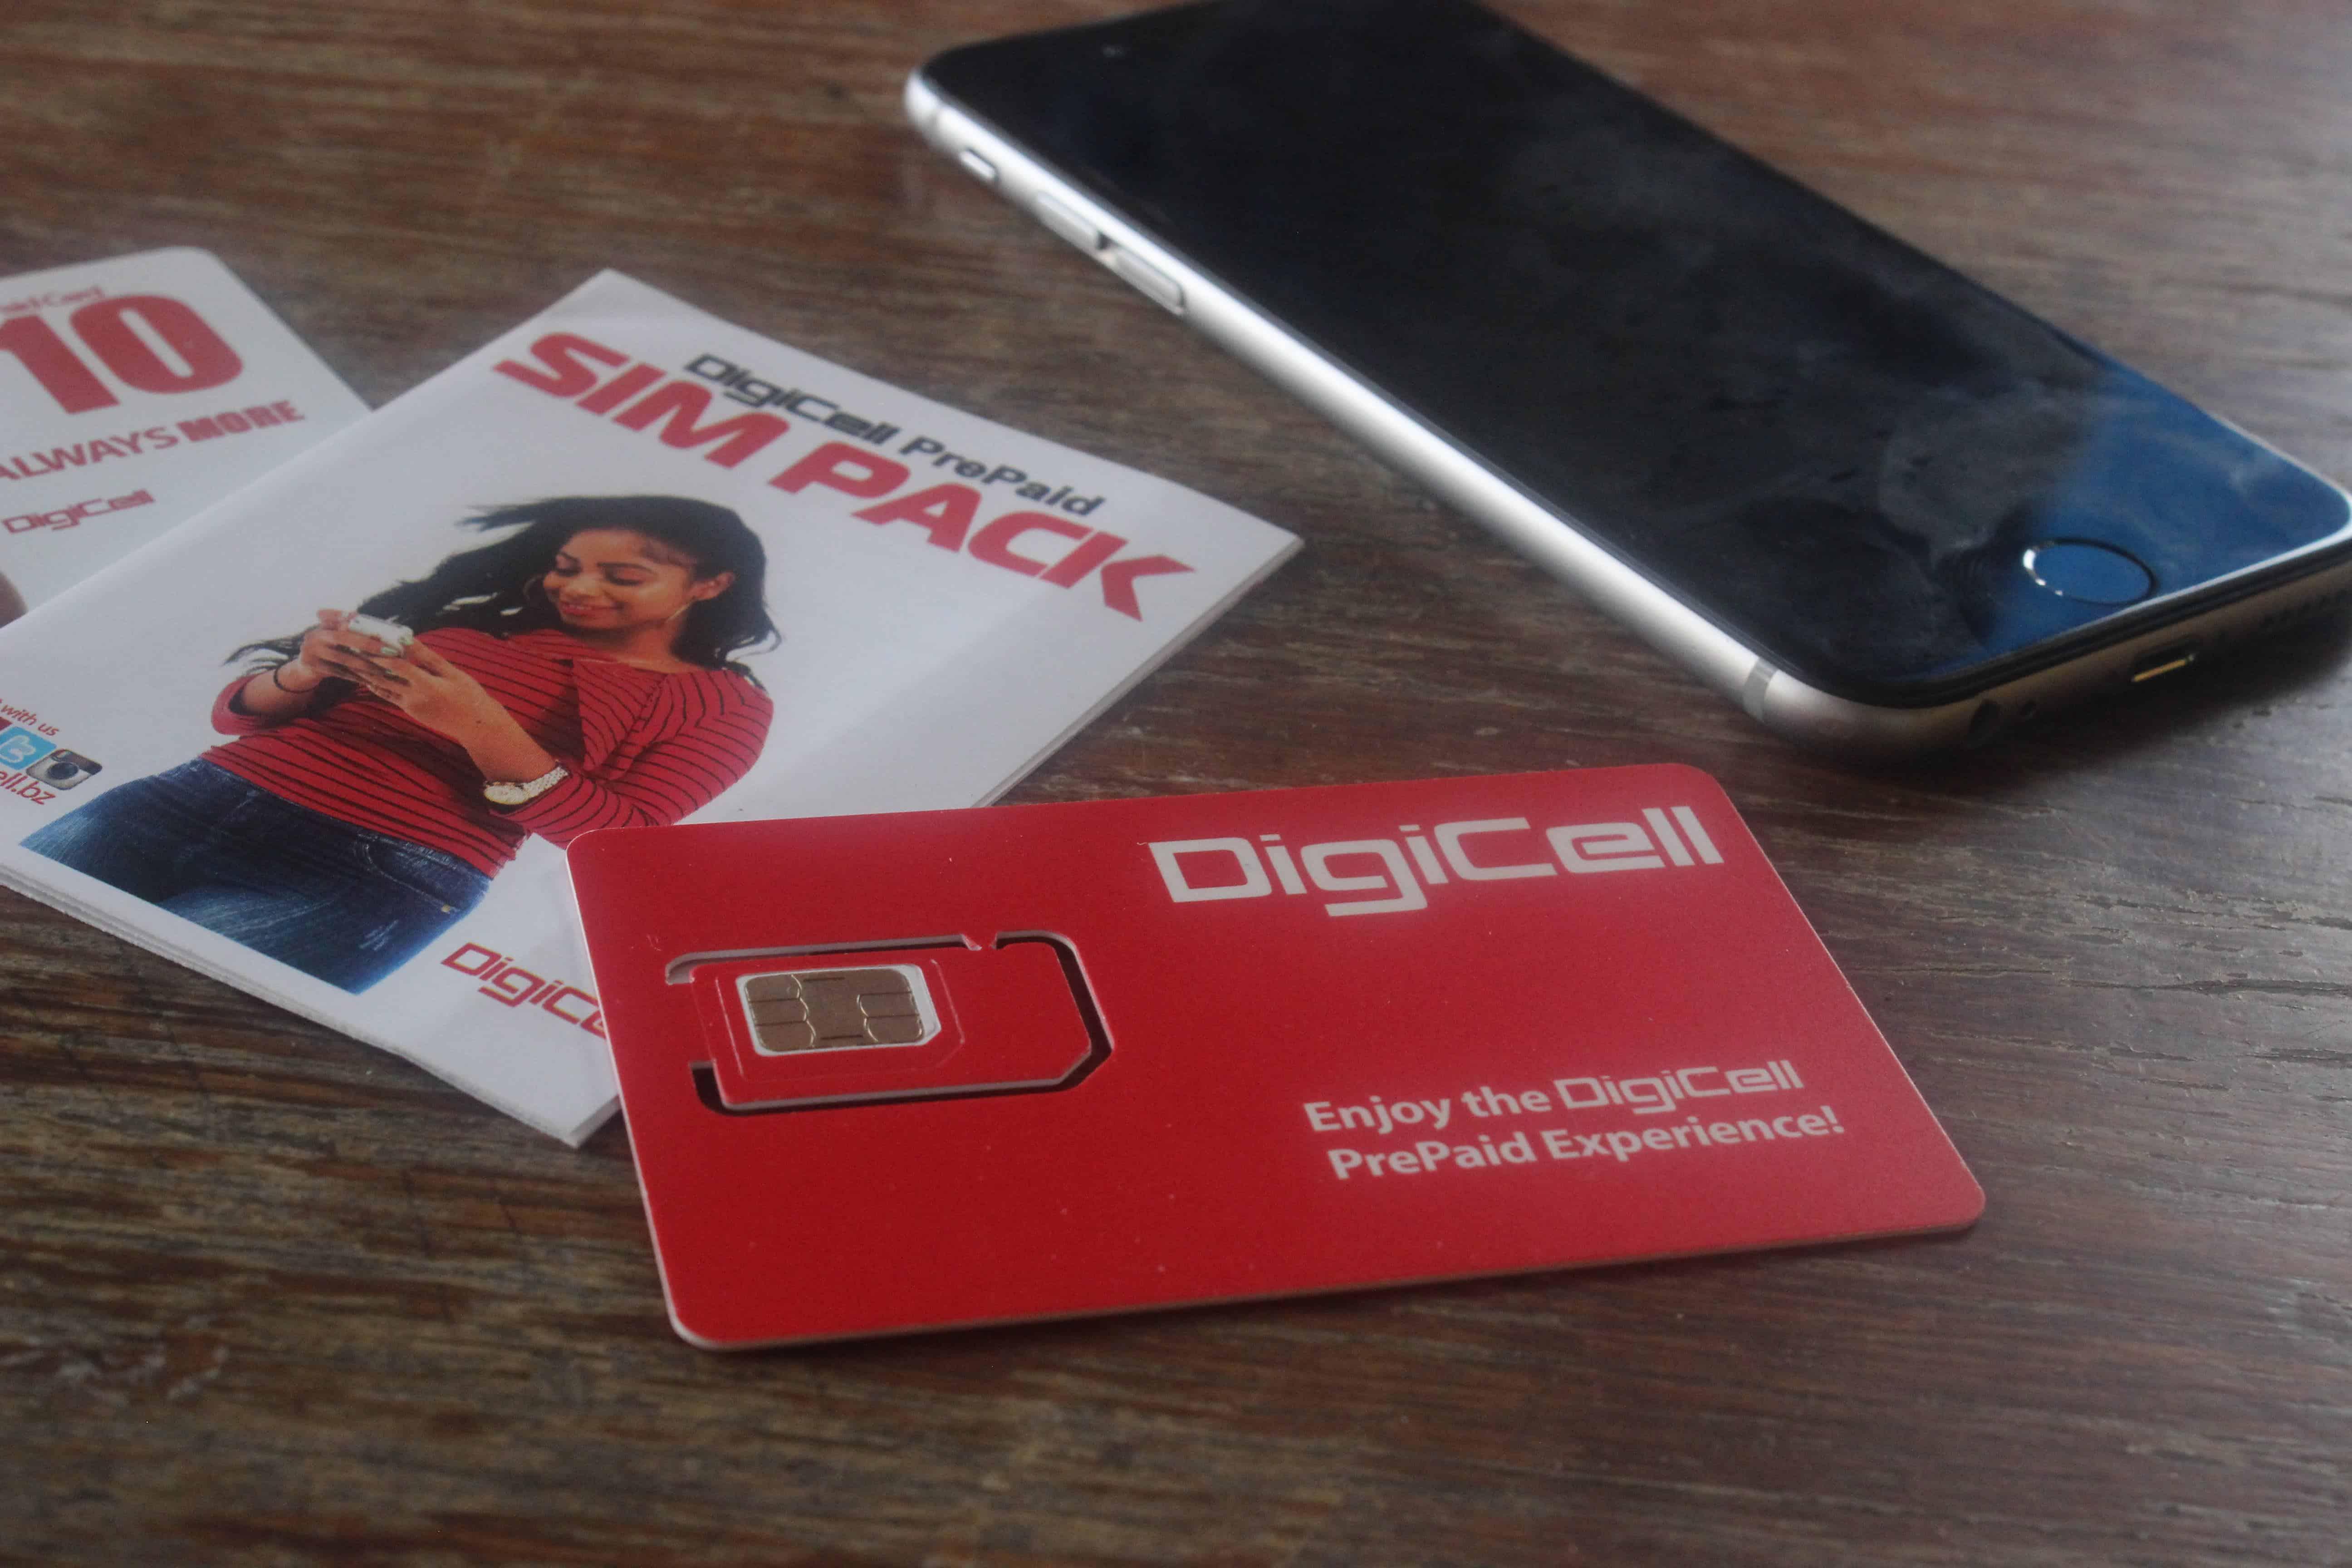 DigiCell SIM Card Belize